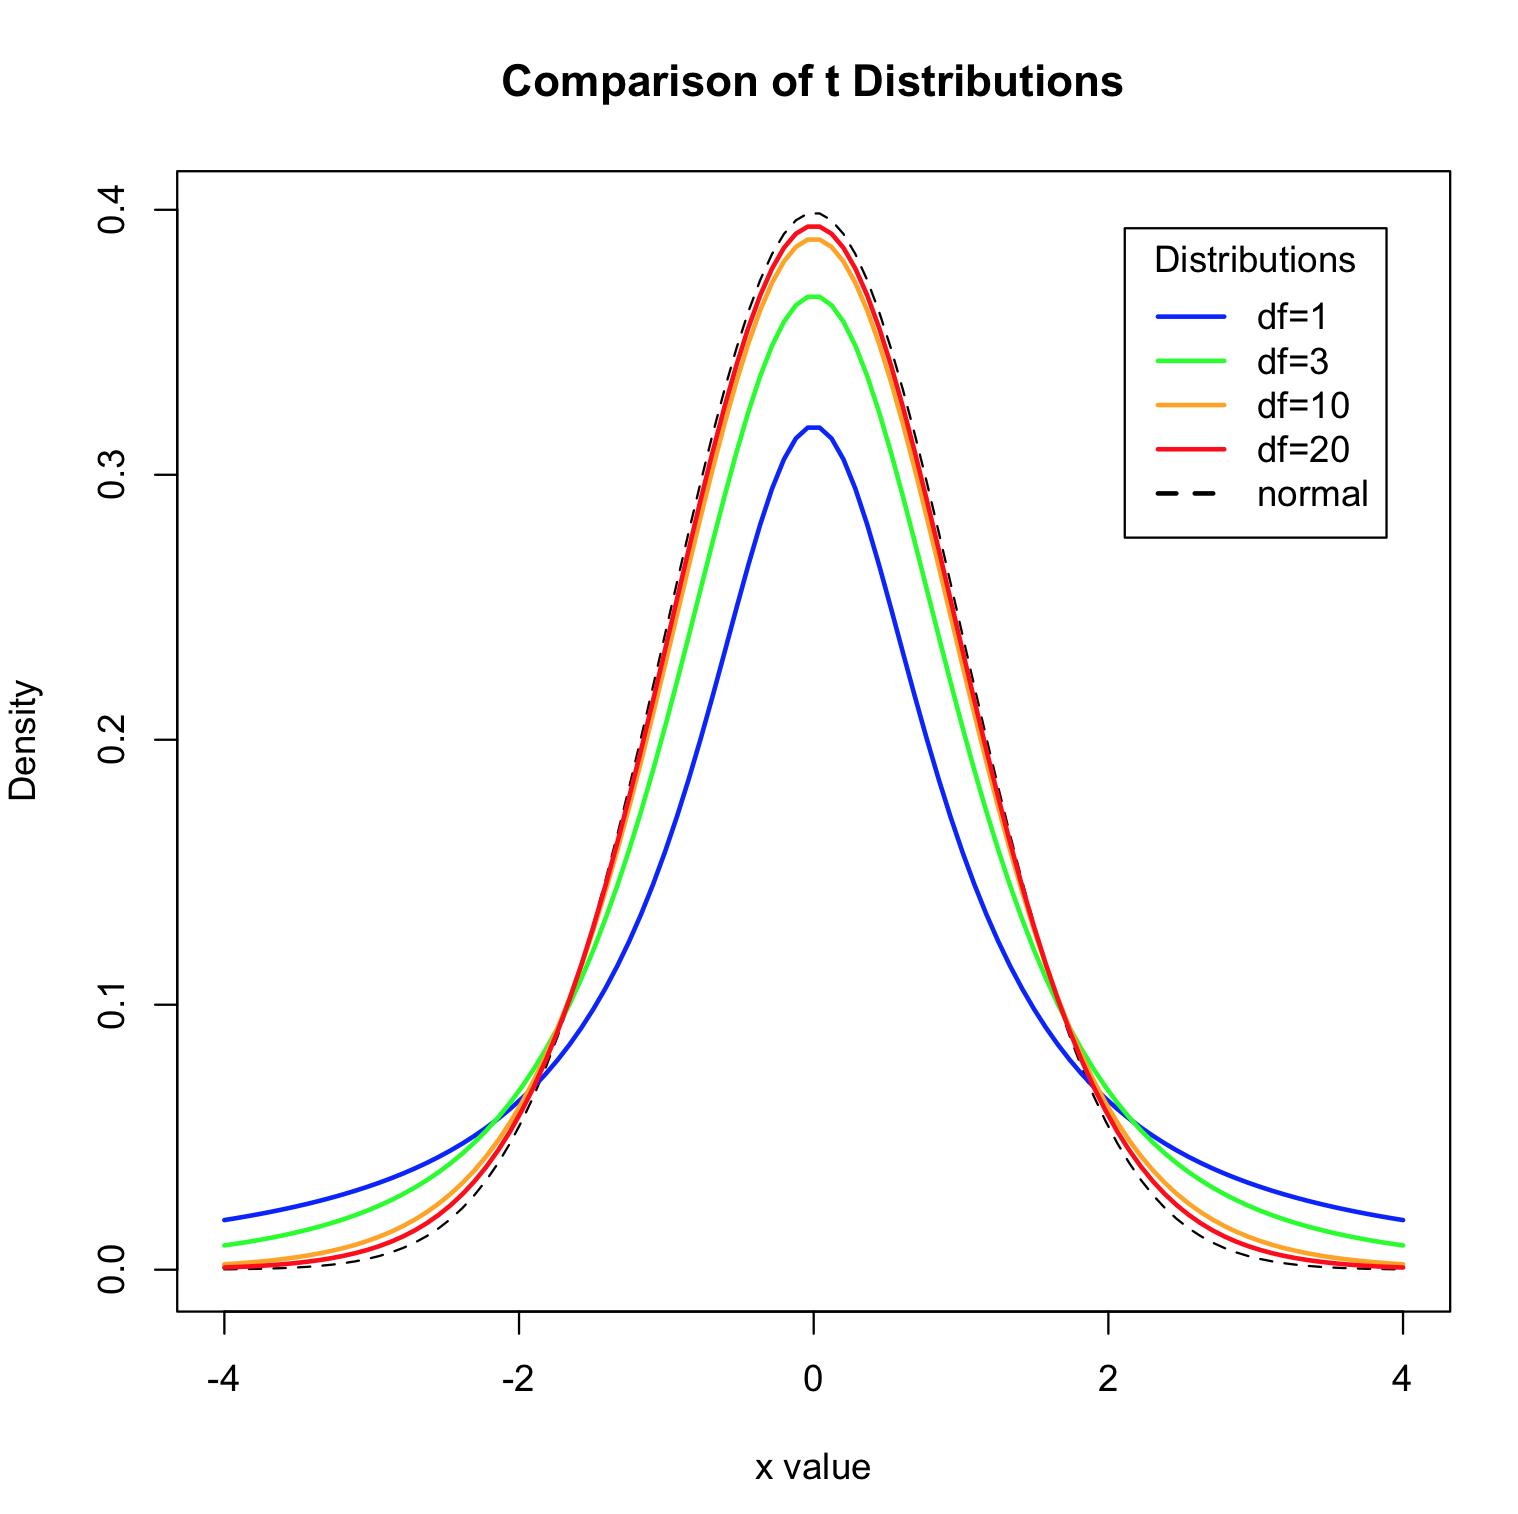 tdistribution